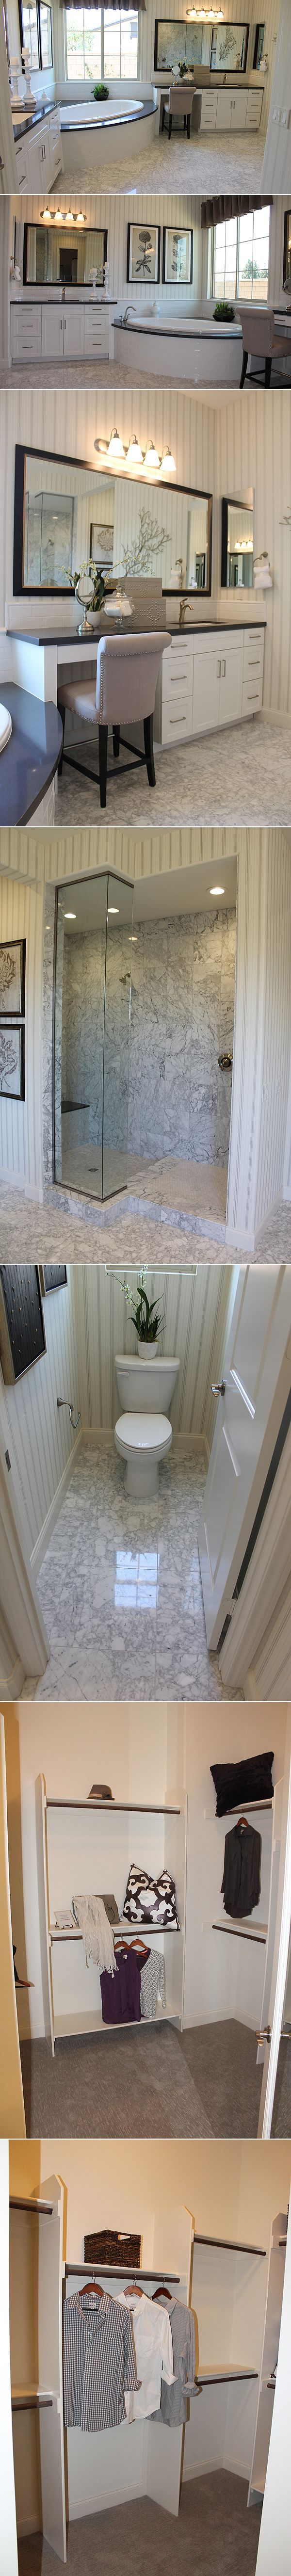 Grayson silver gray jacquard fabric cloth bathroom bath shower curtain - 75 Best Boudoir Studio Ideas Images On Pinterest Studio Ideas Great Deals And Ottomans